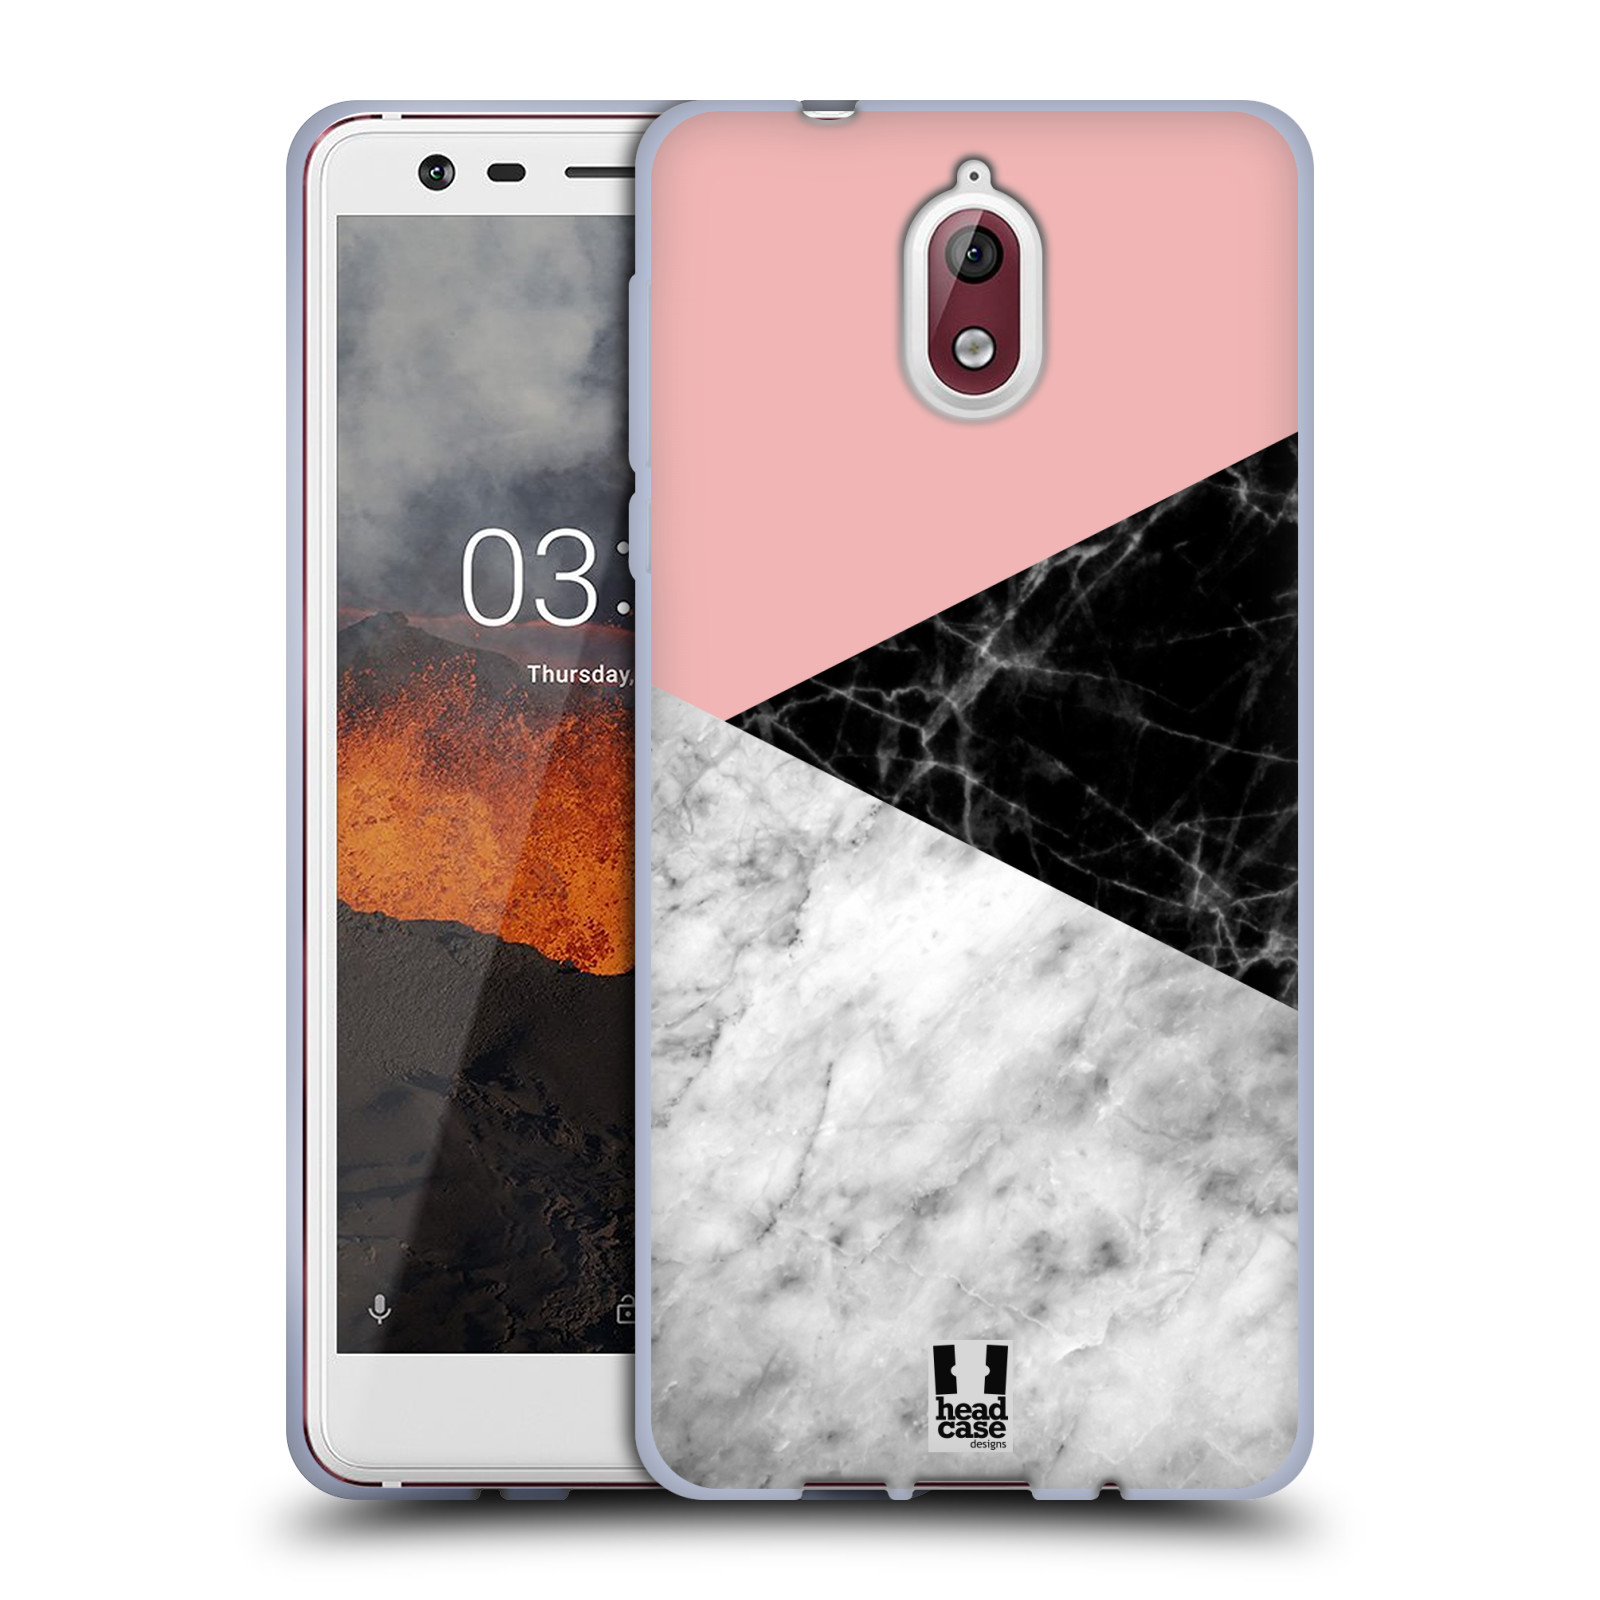 Silikonové pouzdro na mobil Nokia 3.1 - Head Case - Mramor mix